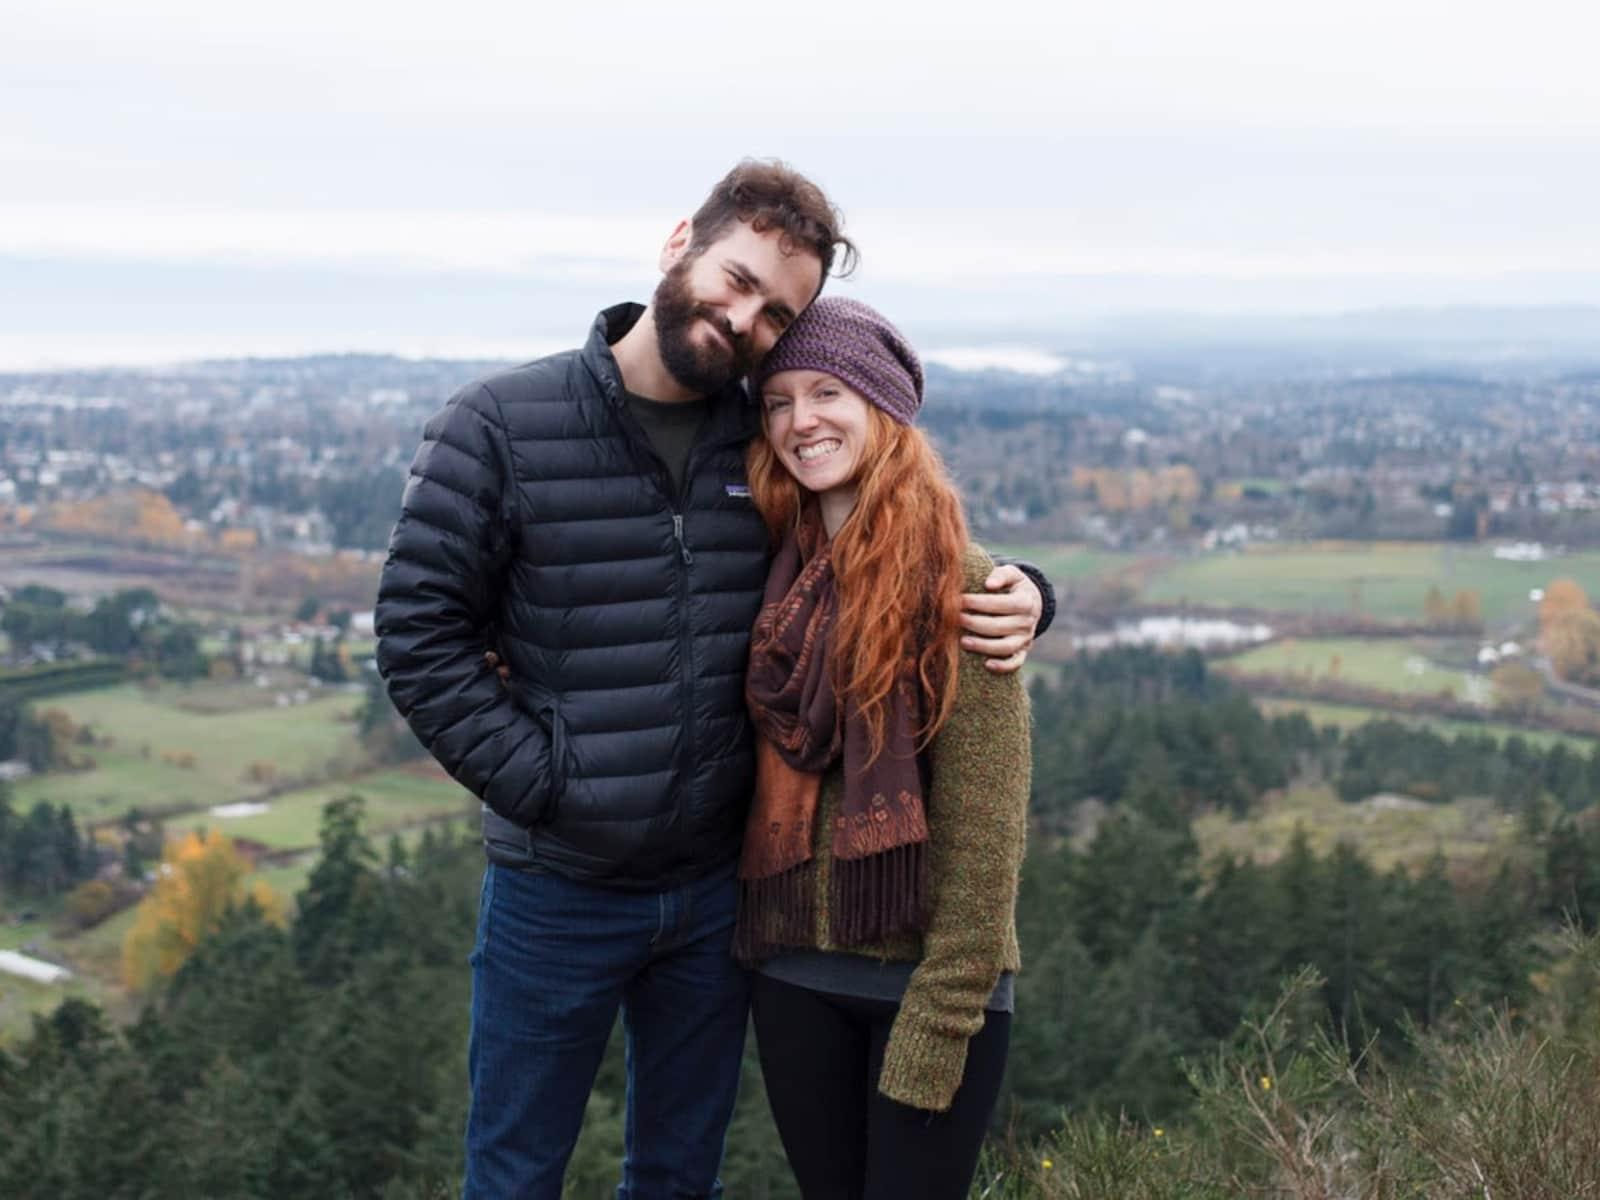 Rachelle & Geoff from Victoria, British Columbia, Canada